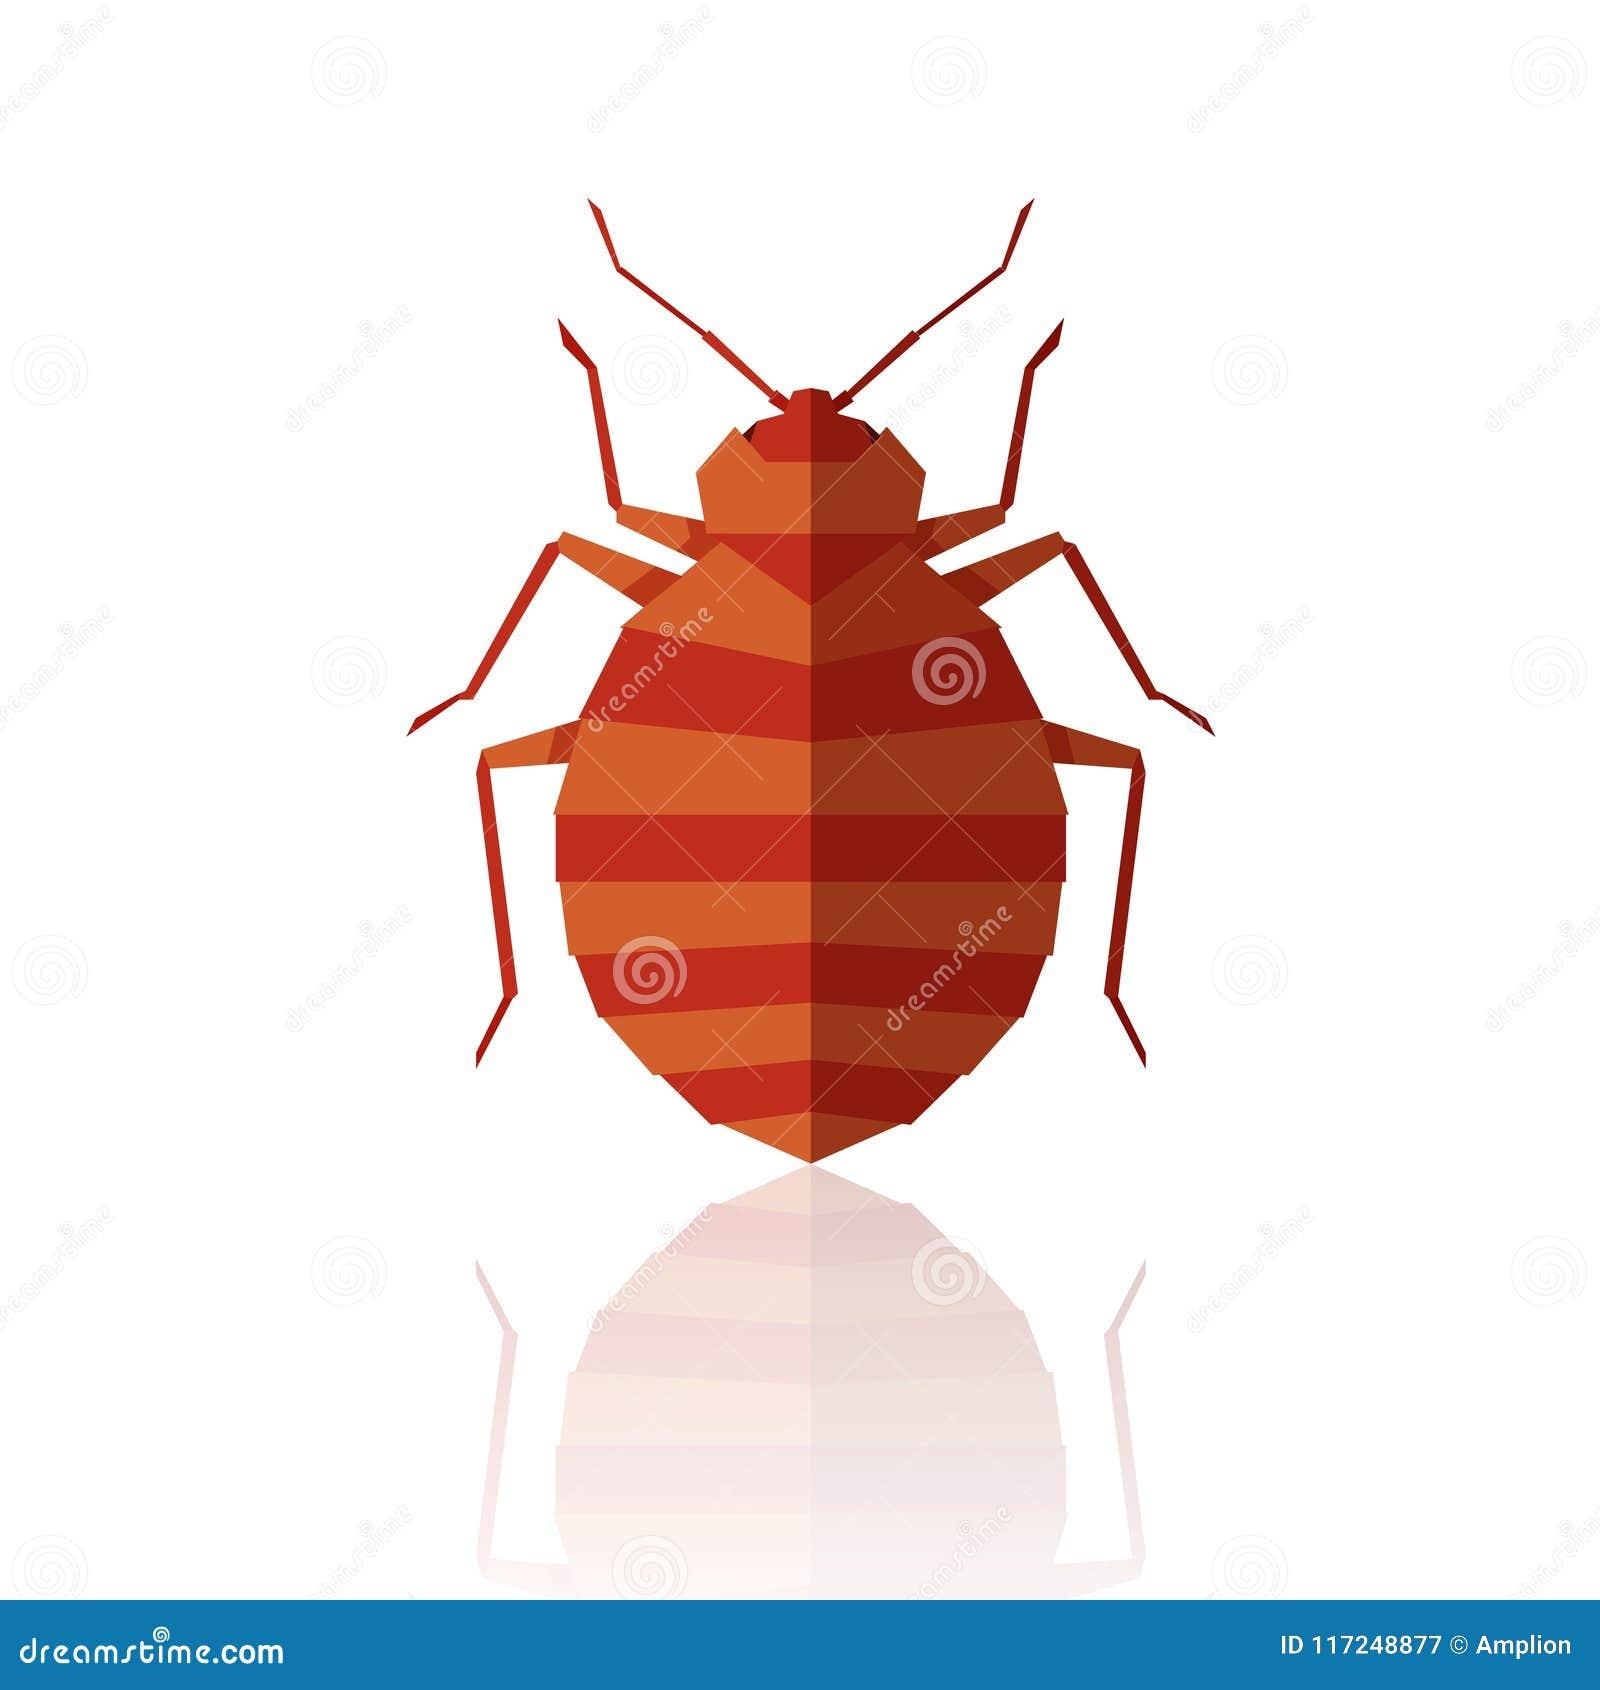 Flat Geometric Bedbug Stock Vector Illustration Of Antennae 117248877